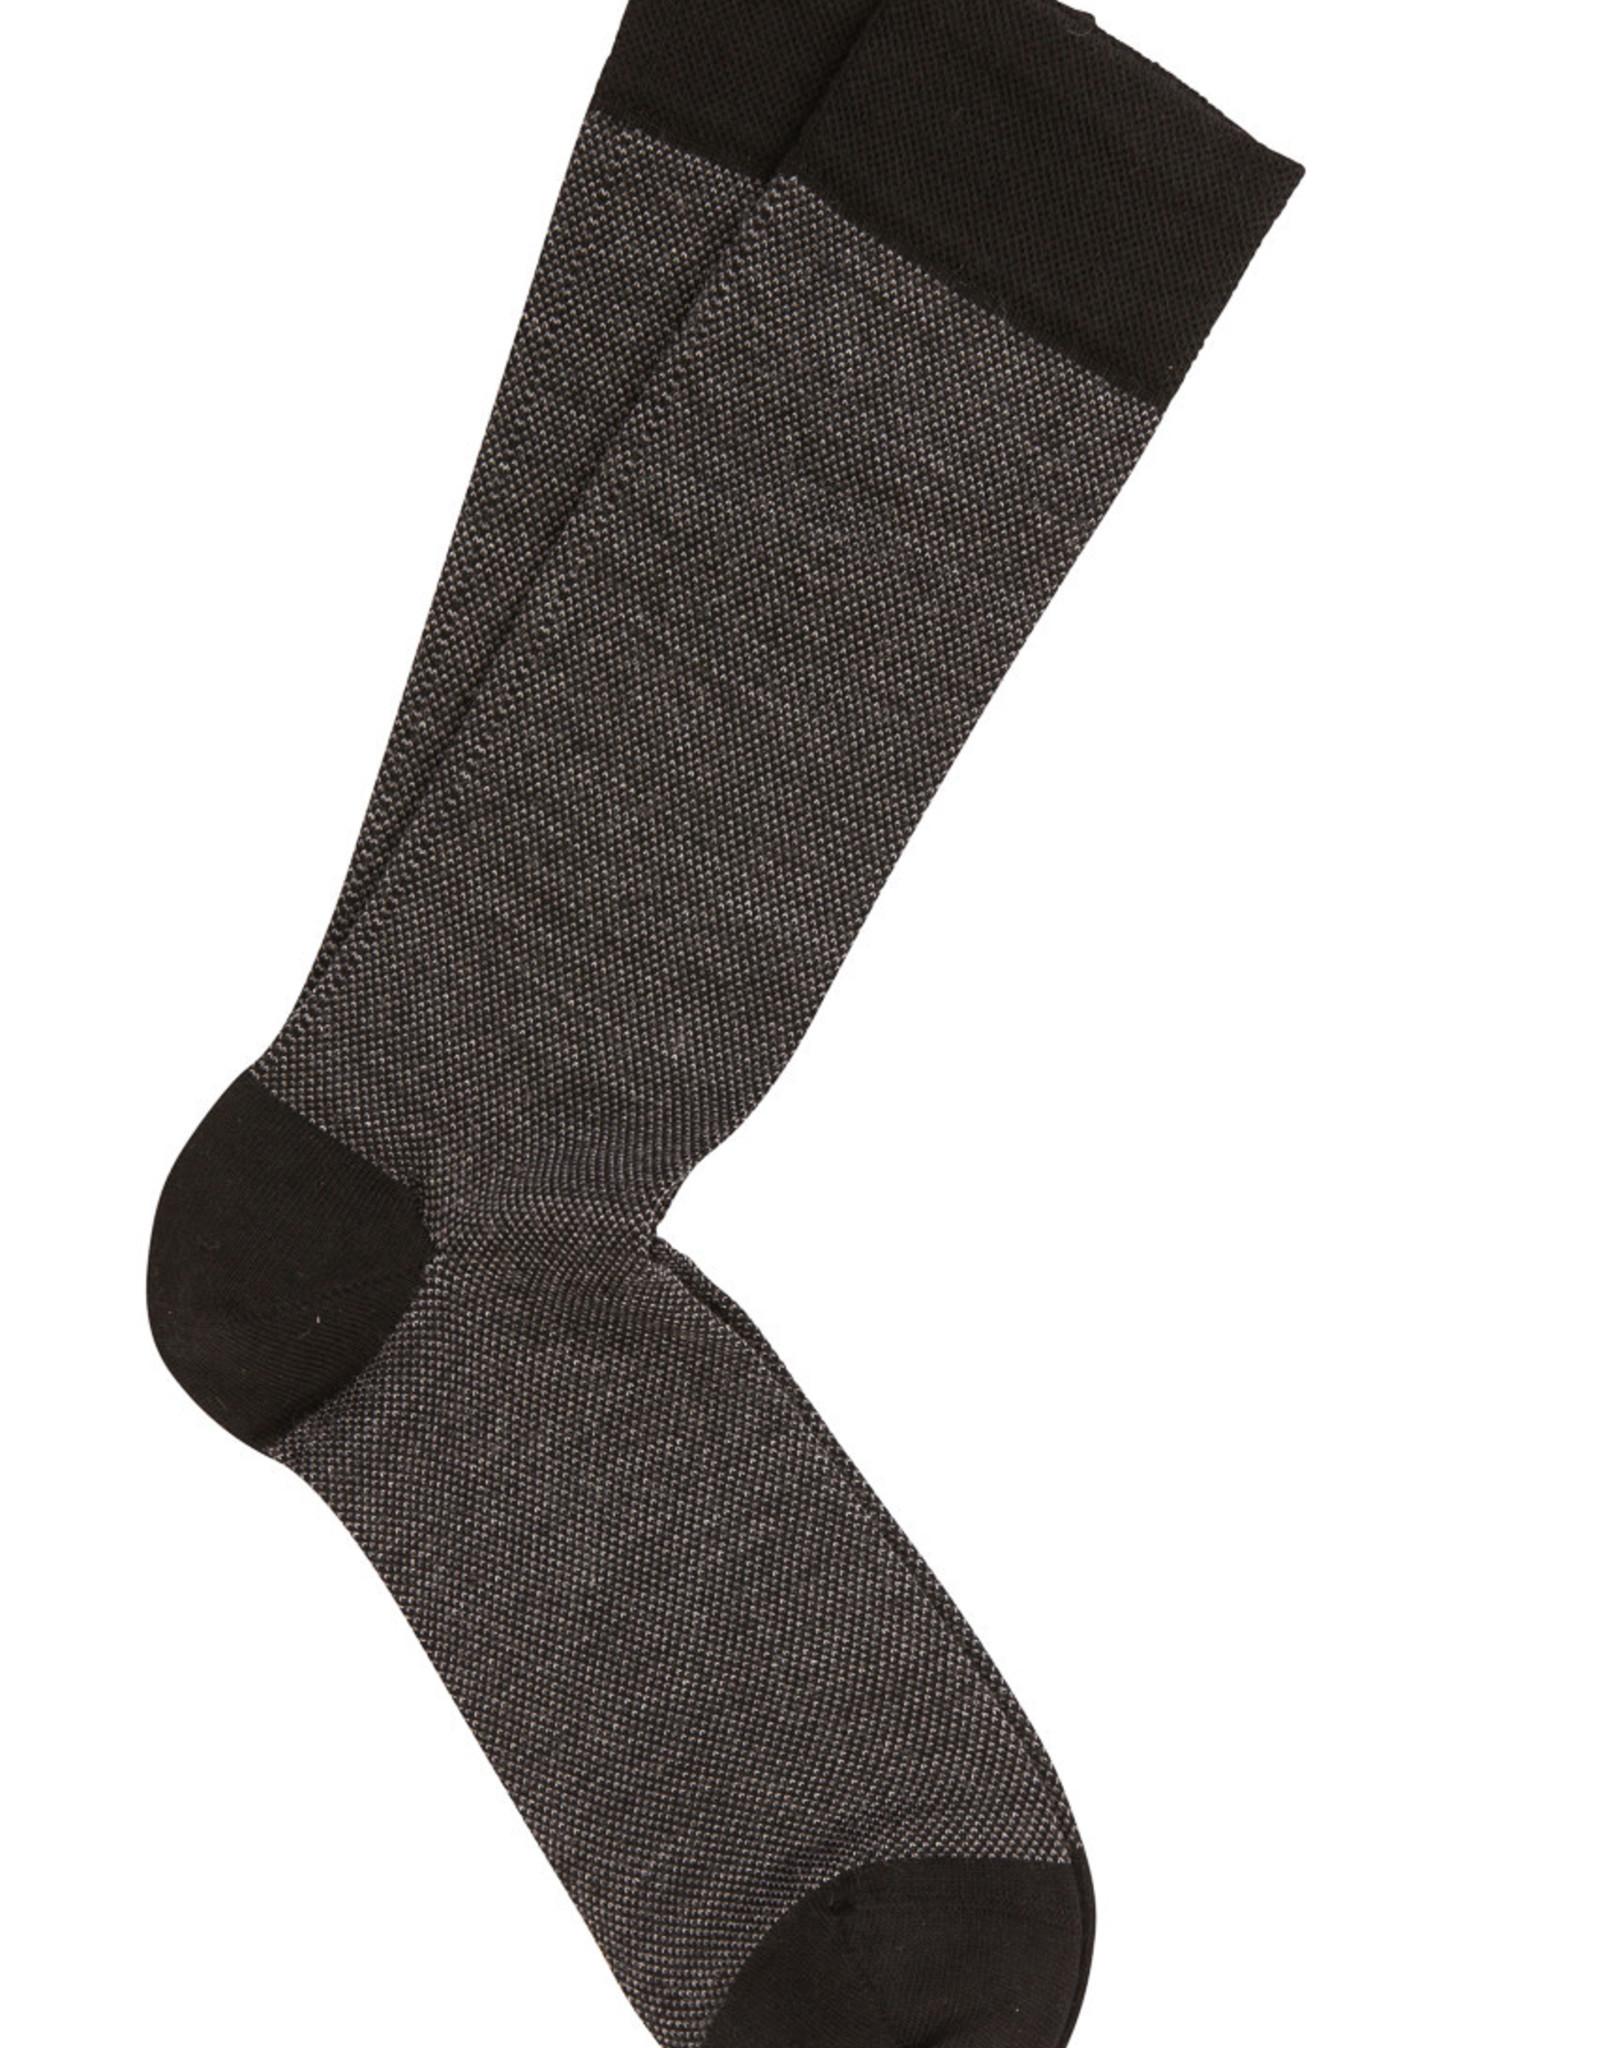 Marcoliani Marcoliani sokken zwart wol 4060T